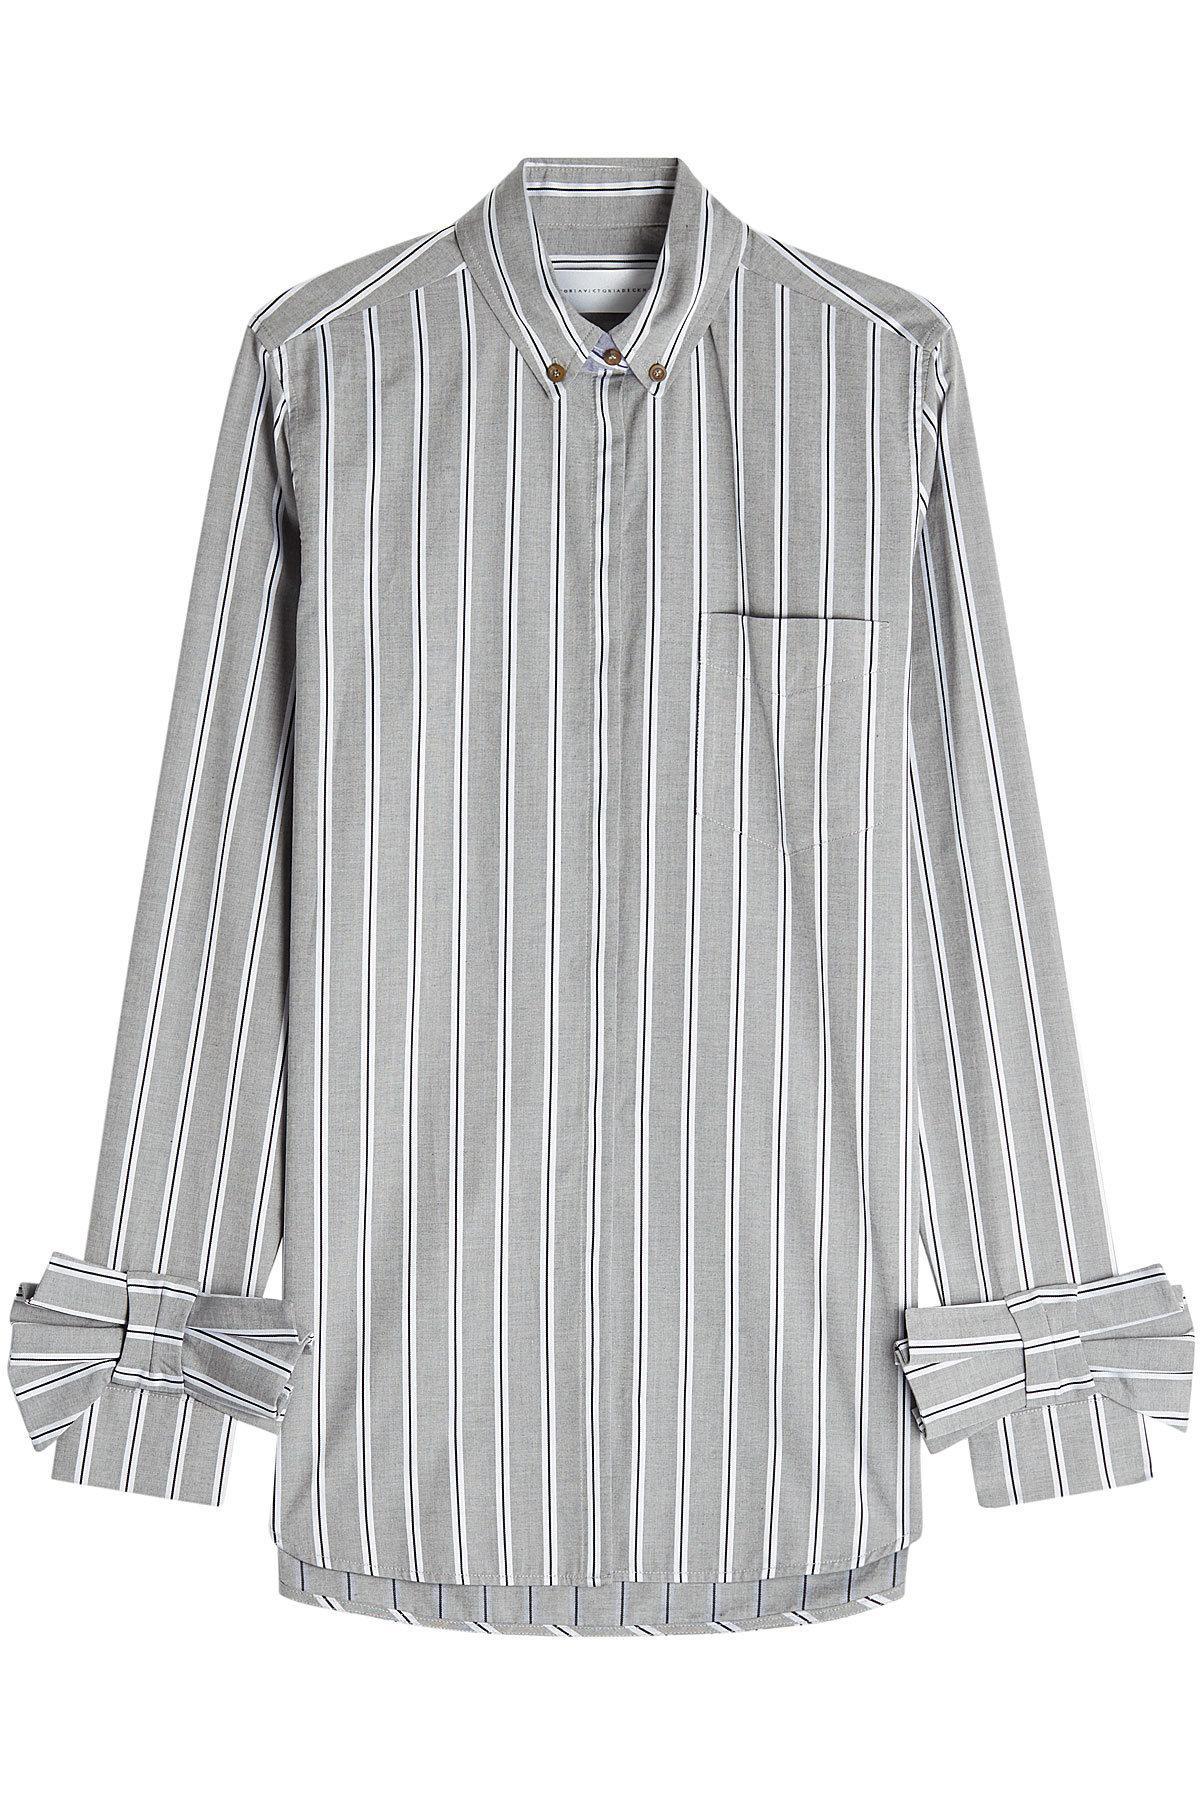 Victoria Victoria Beckham Cotton Shirt With Bow Cuffs In Stripes